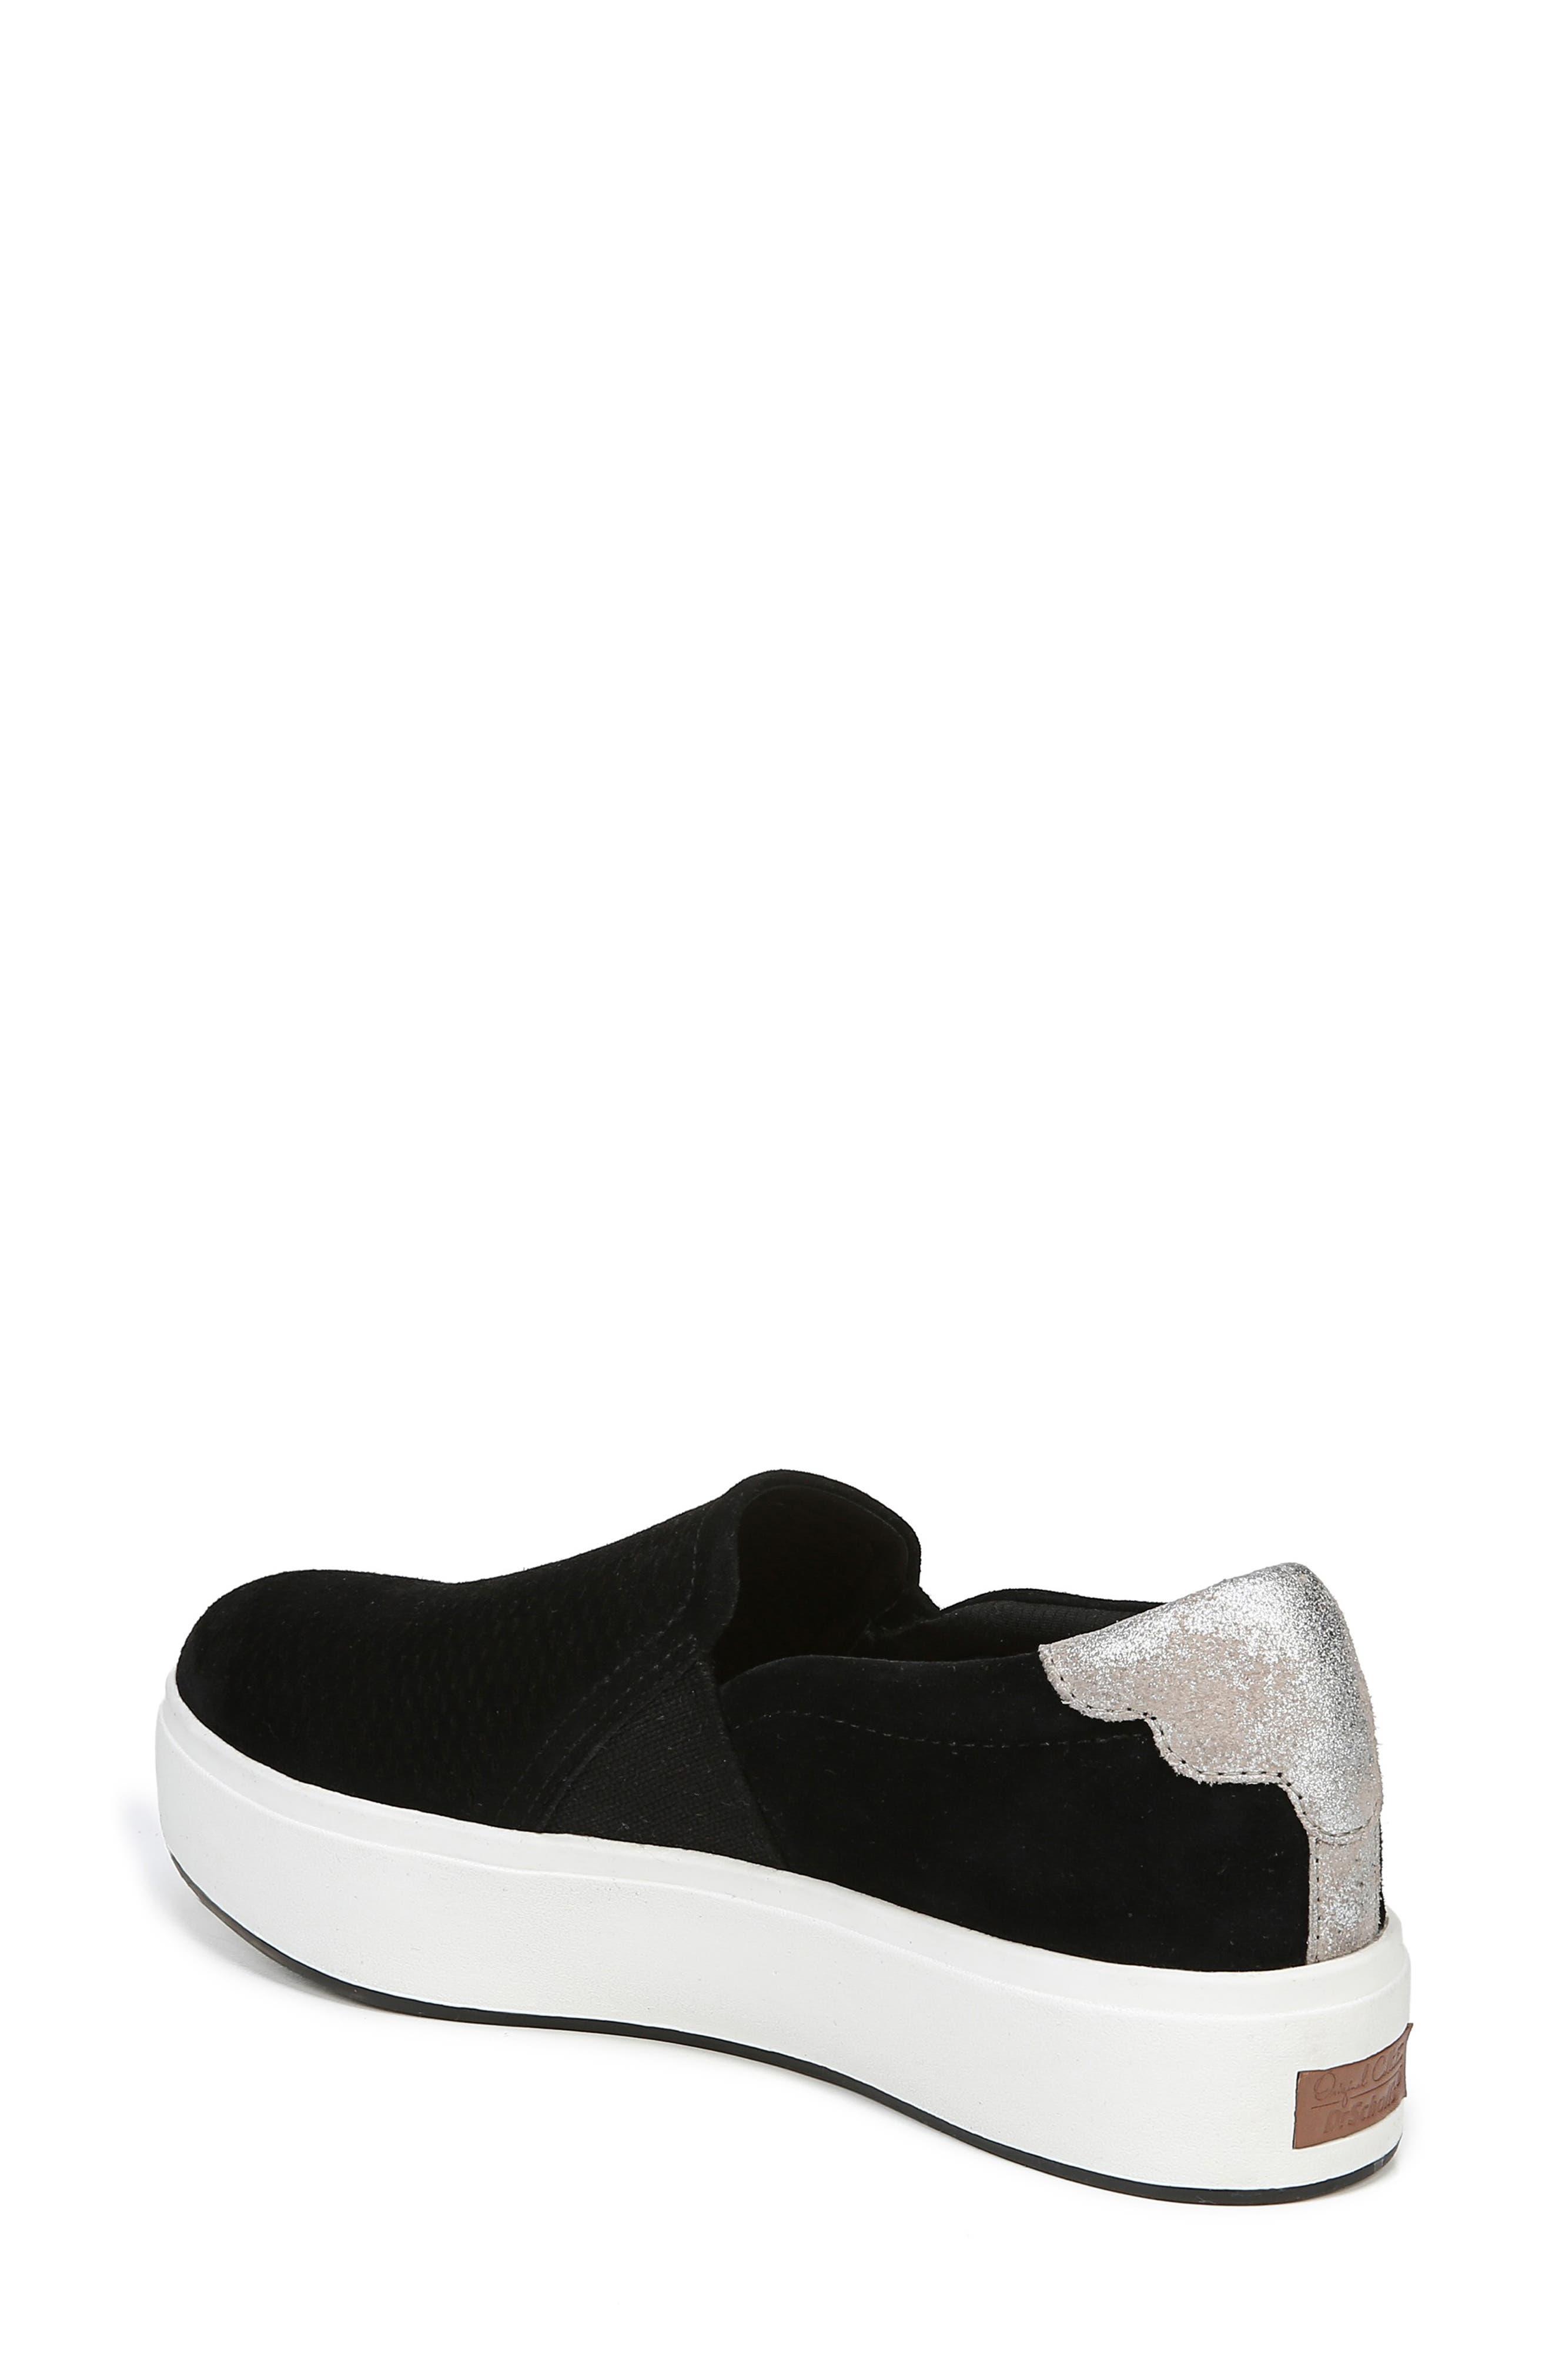 Abbot Lux Sneaker,                             Alternate thumbnail 2, color,                             BLACK SUEDE